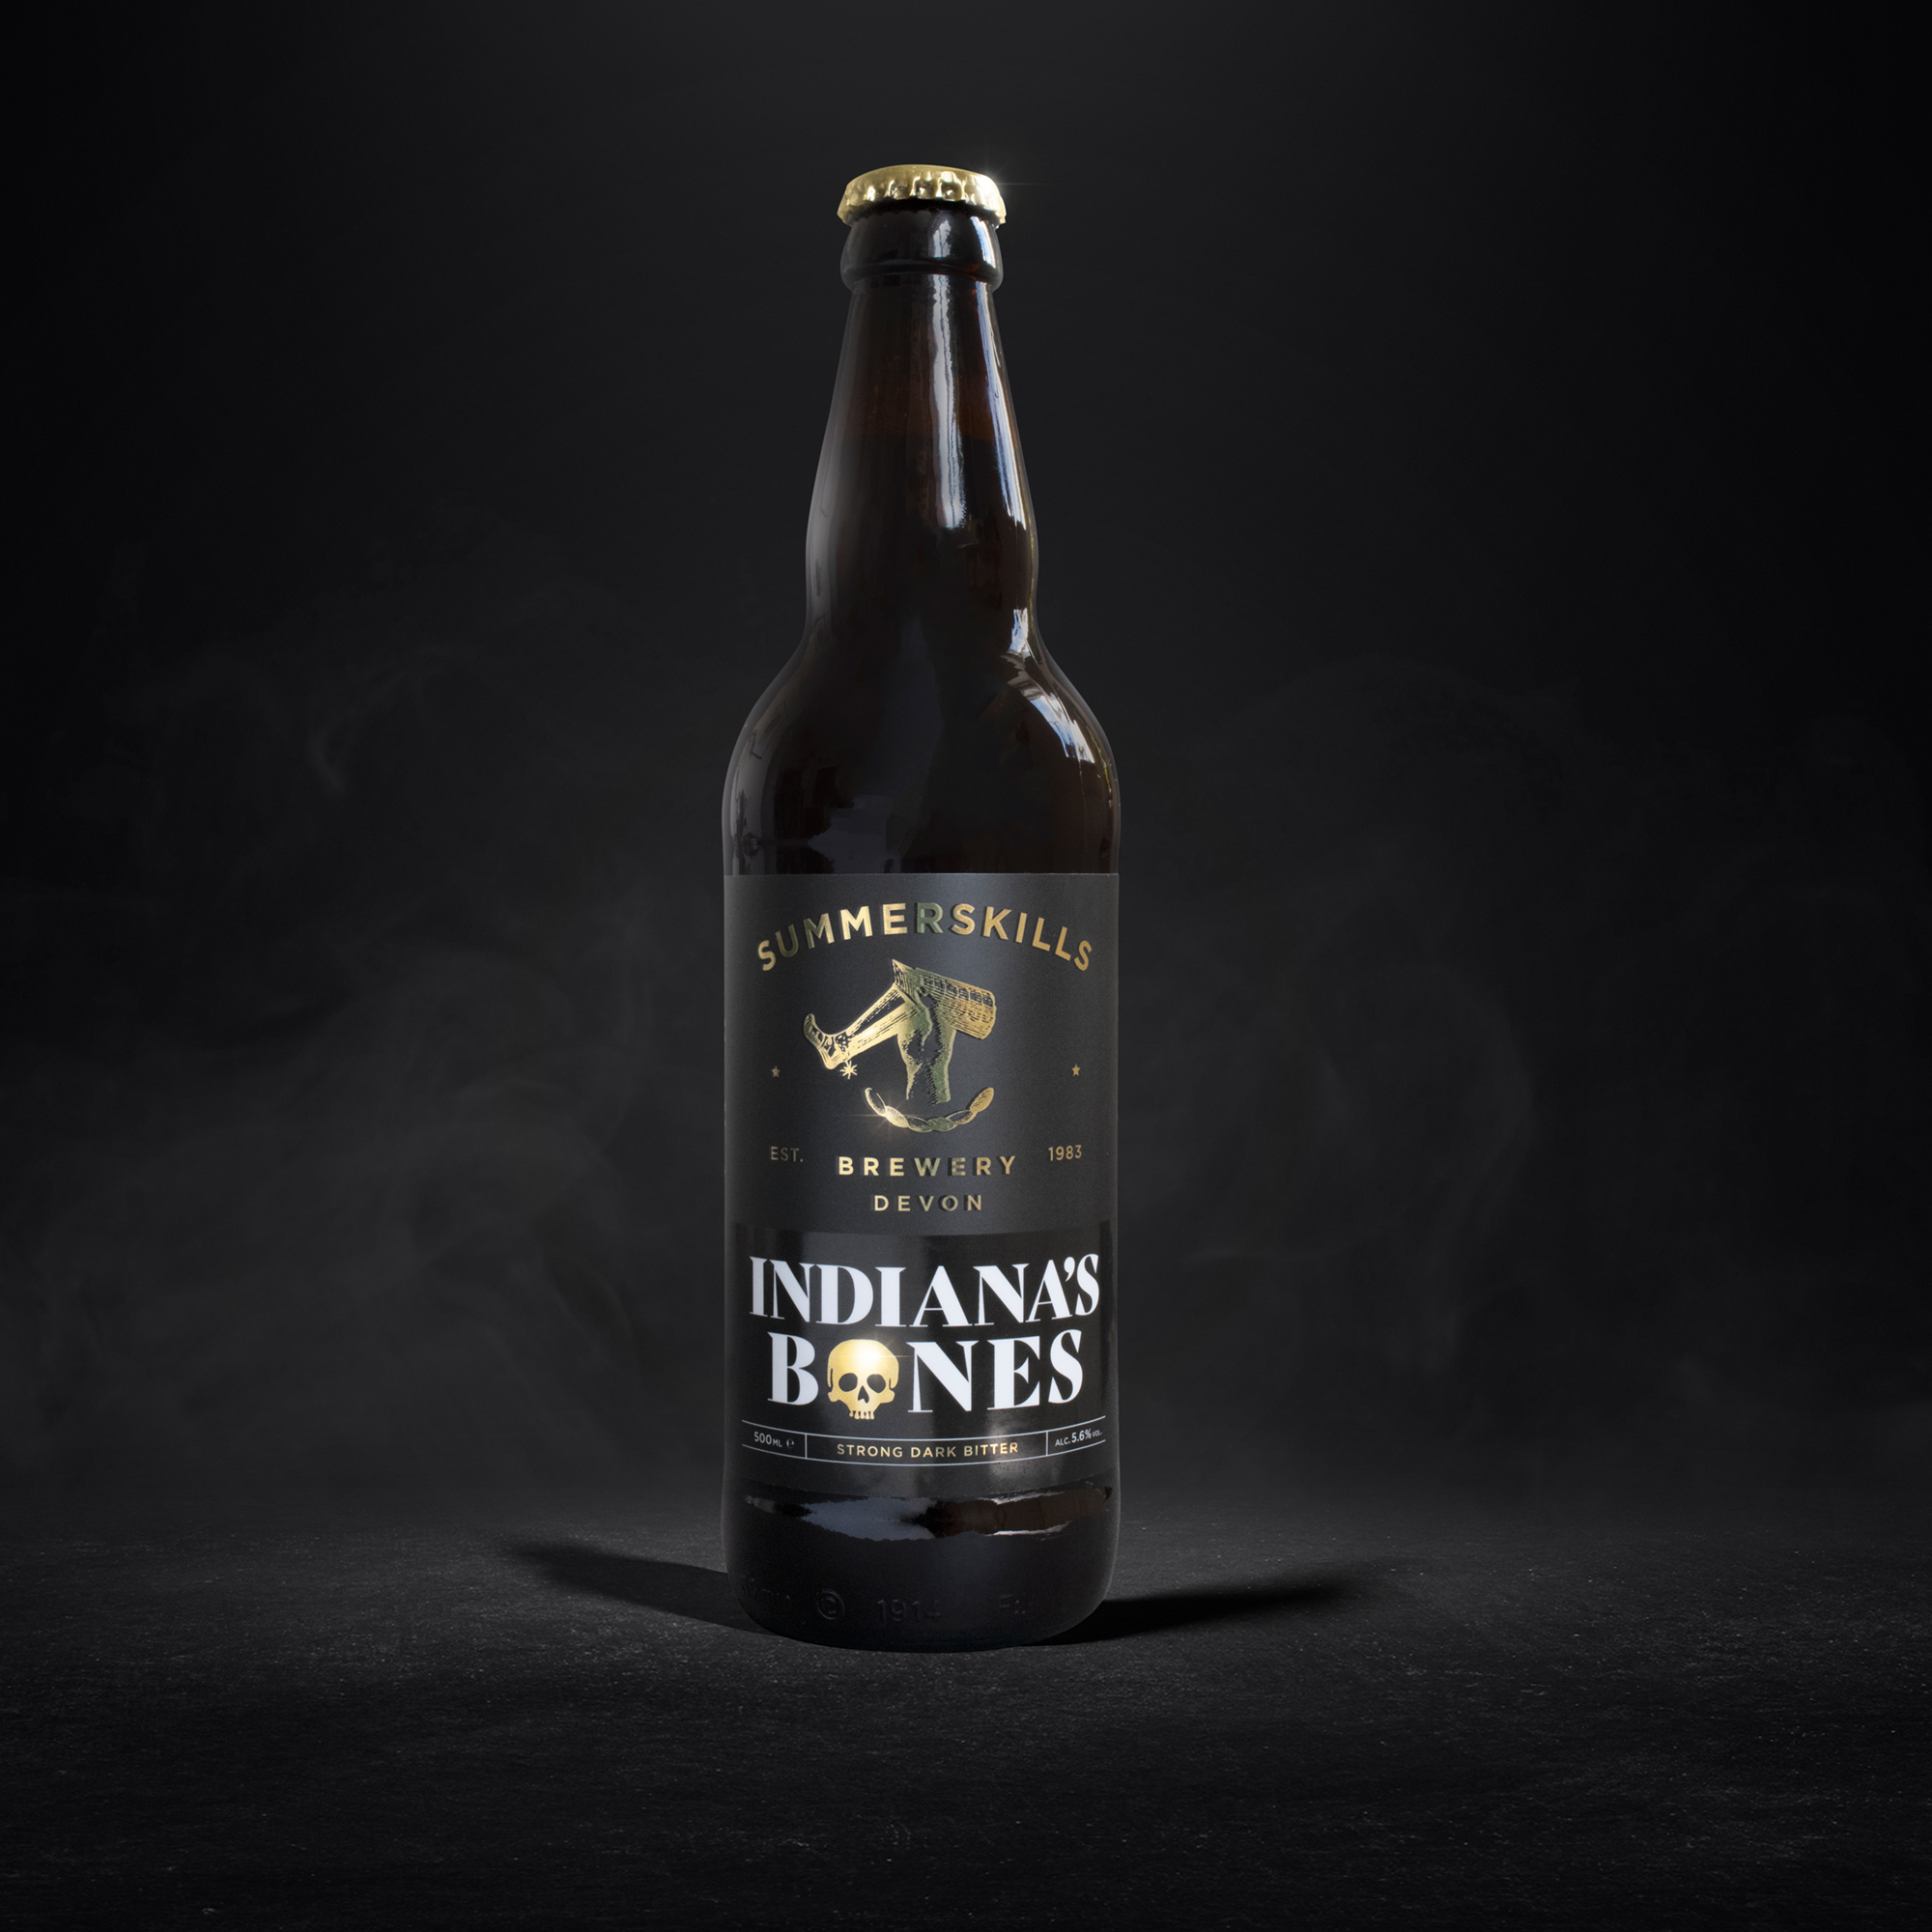 Summerskills Brewery ale packaging by Drive Creative Studio